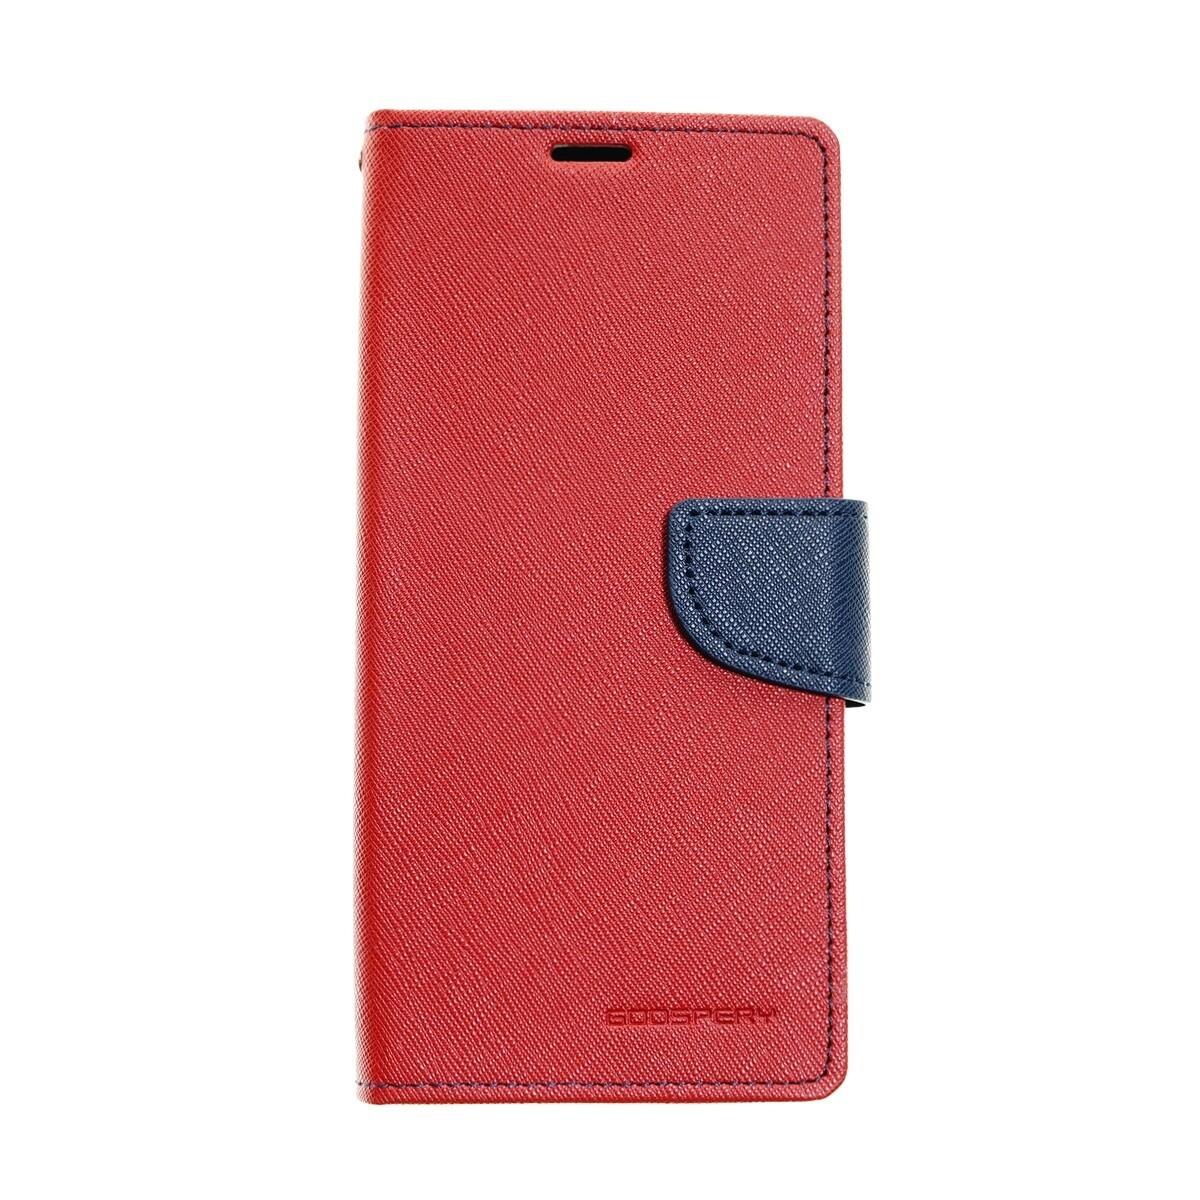 Estuche GOOSPERY Fancy Diary Rojo/Azul Marino  - Iphone 6 Plus